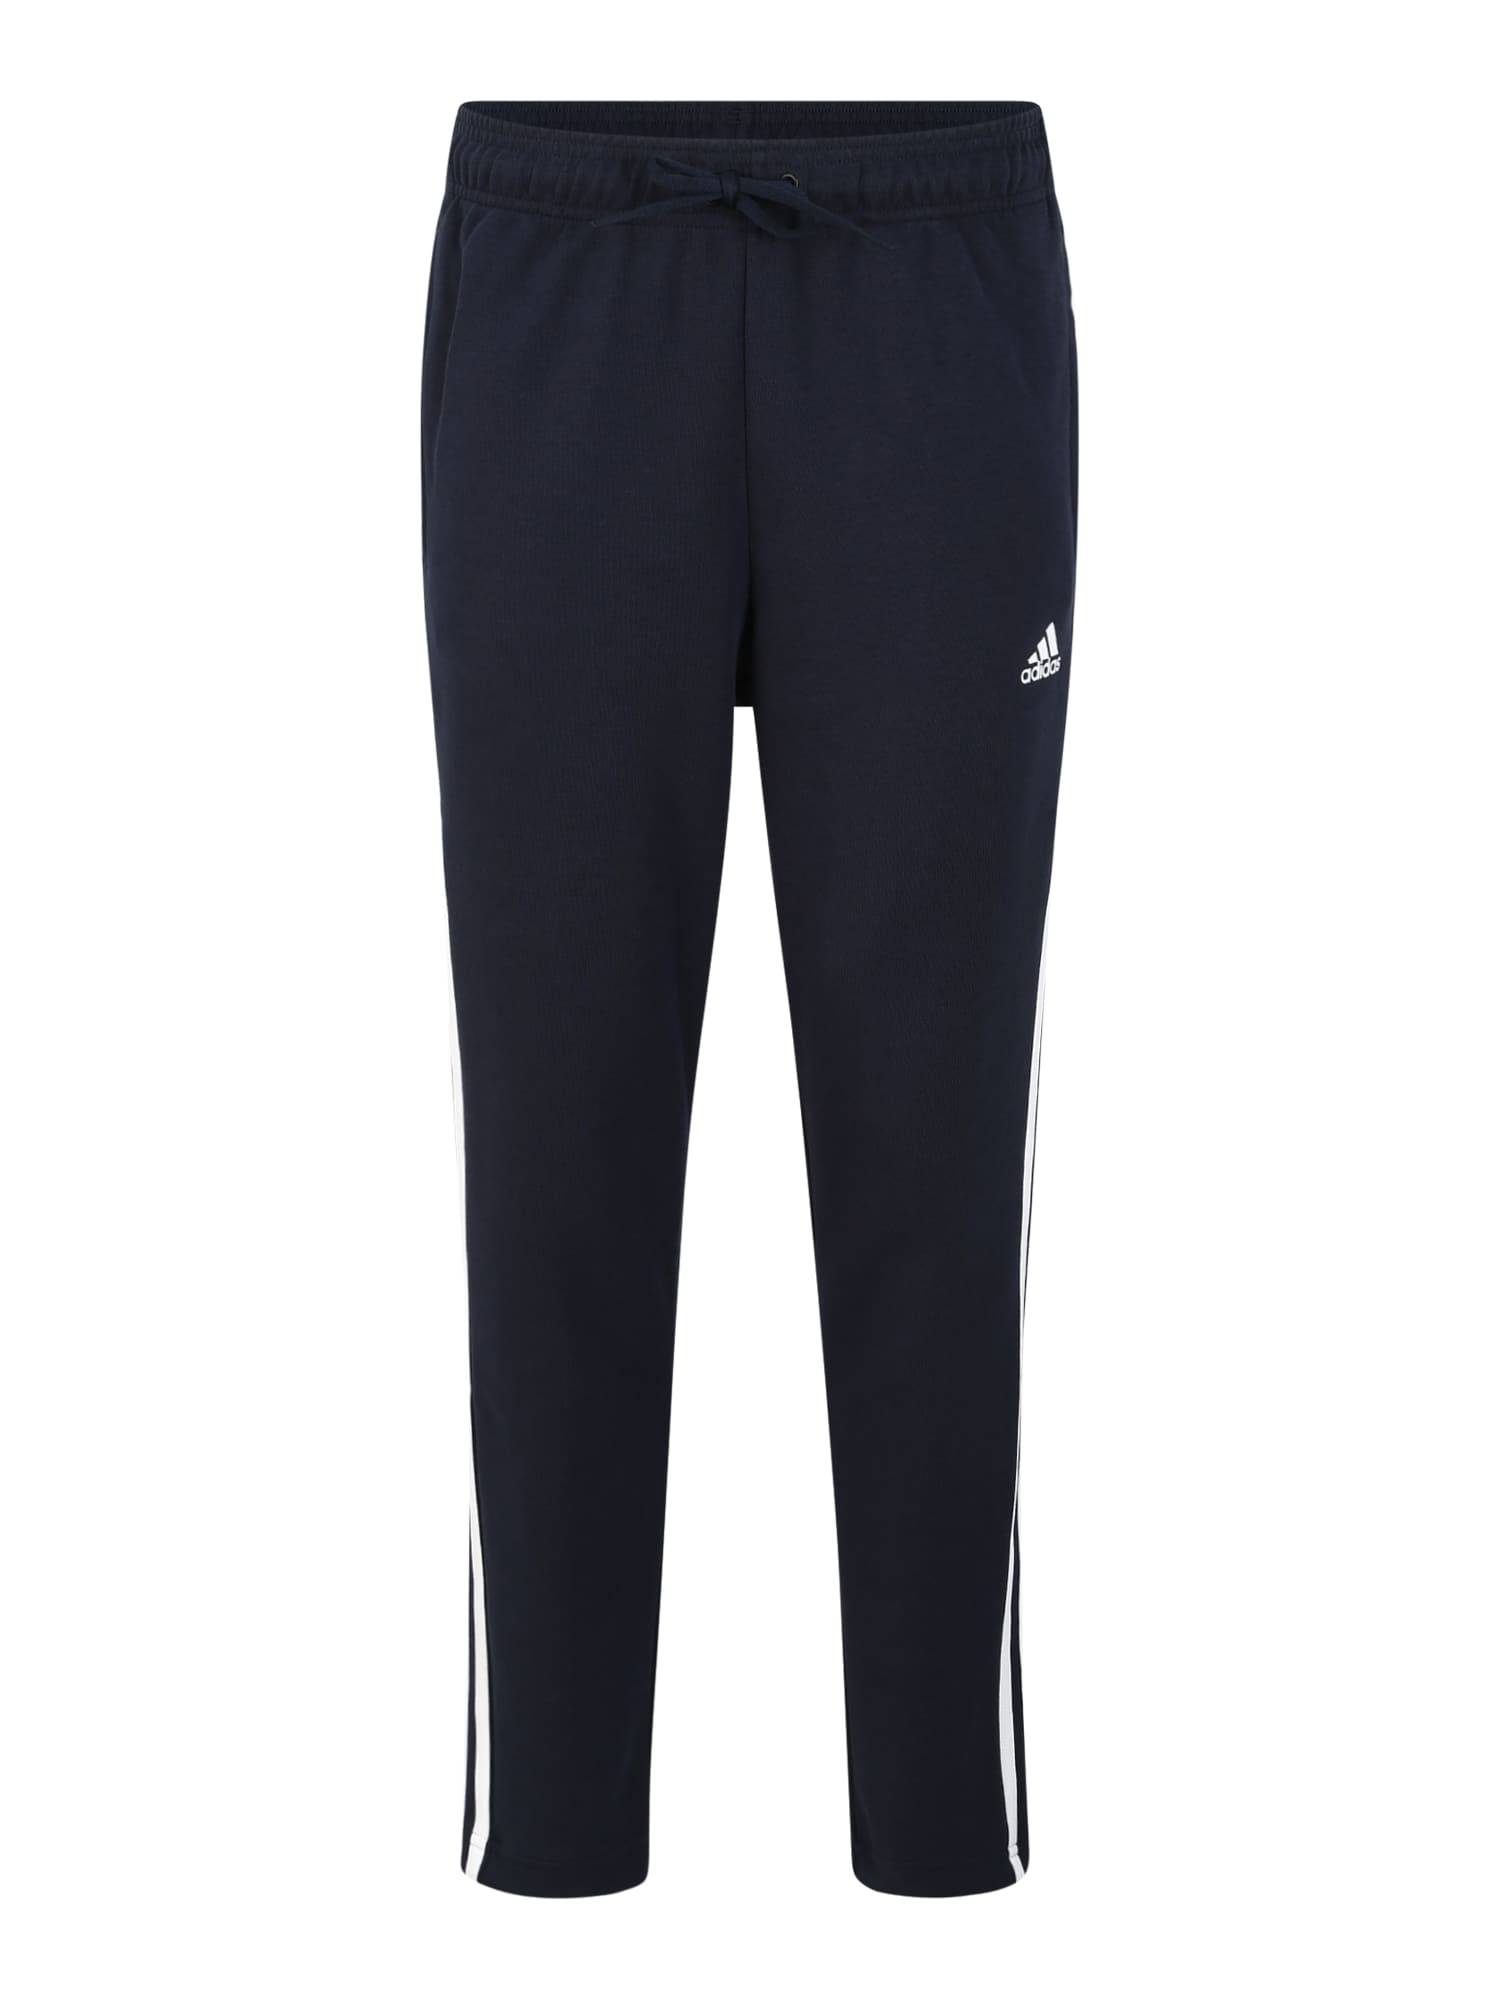 ADIDAS PERFORMANCE Športové nohavice  biela / tmavomodrá